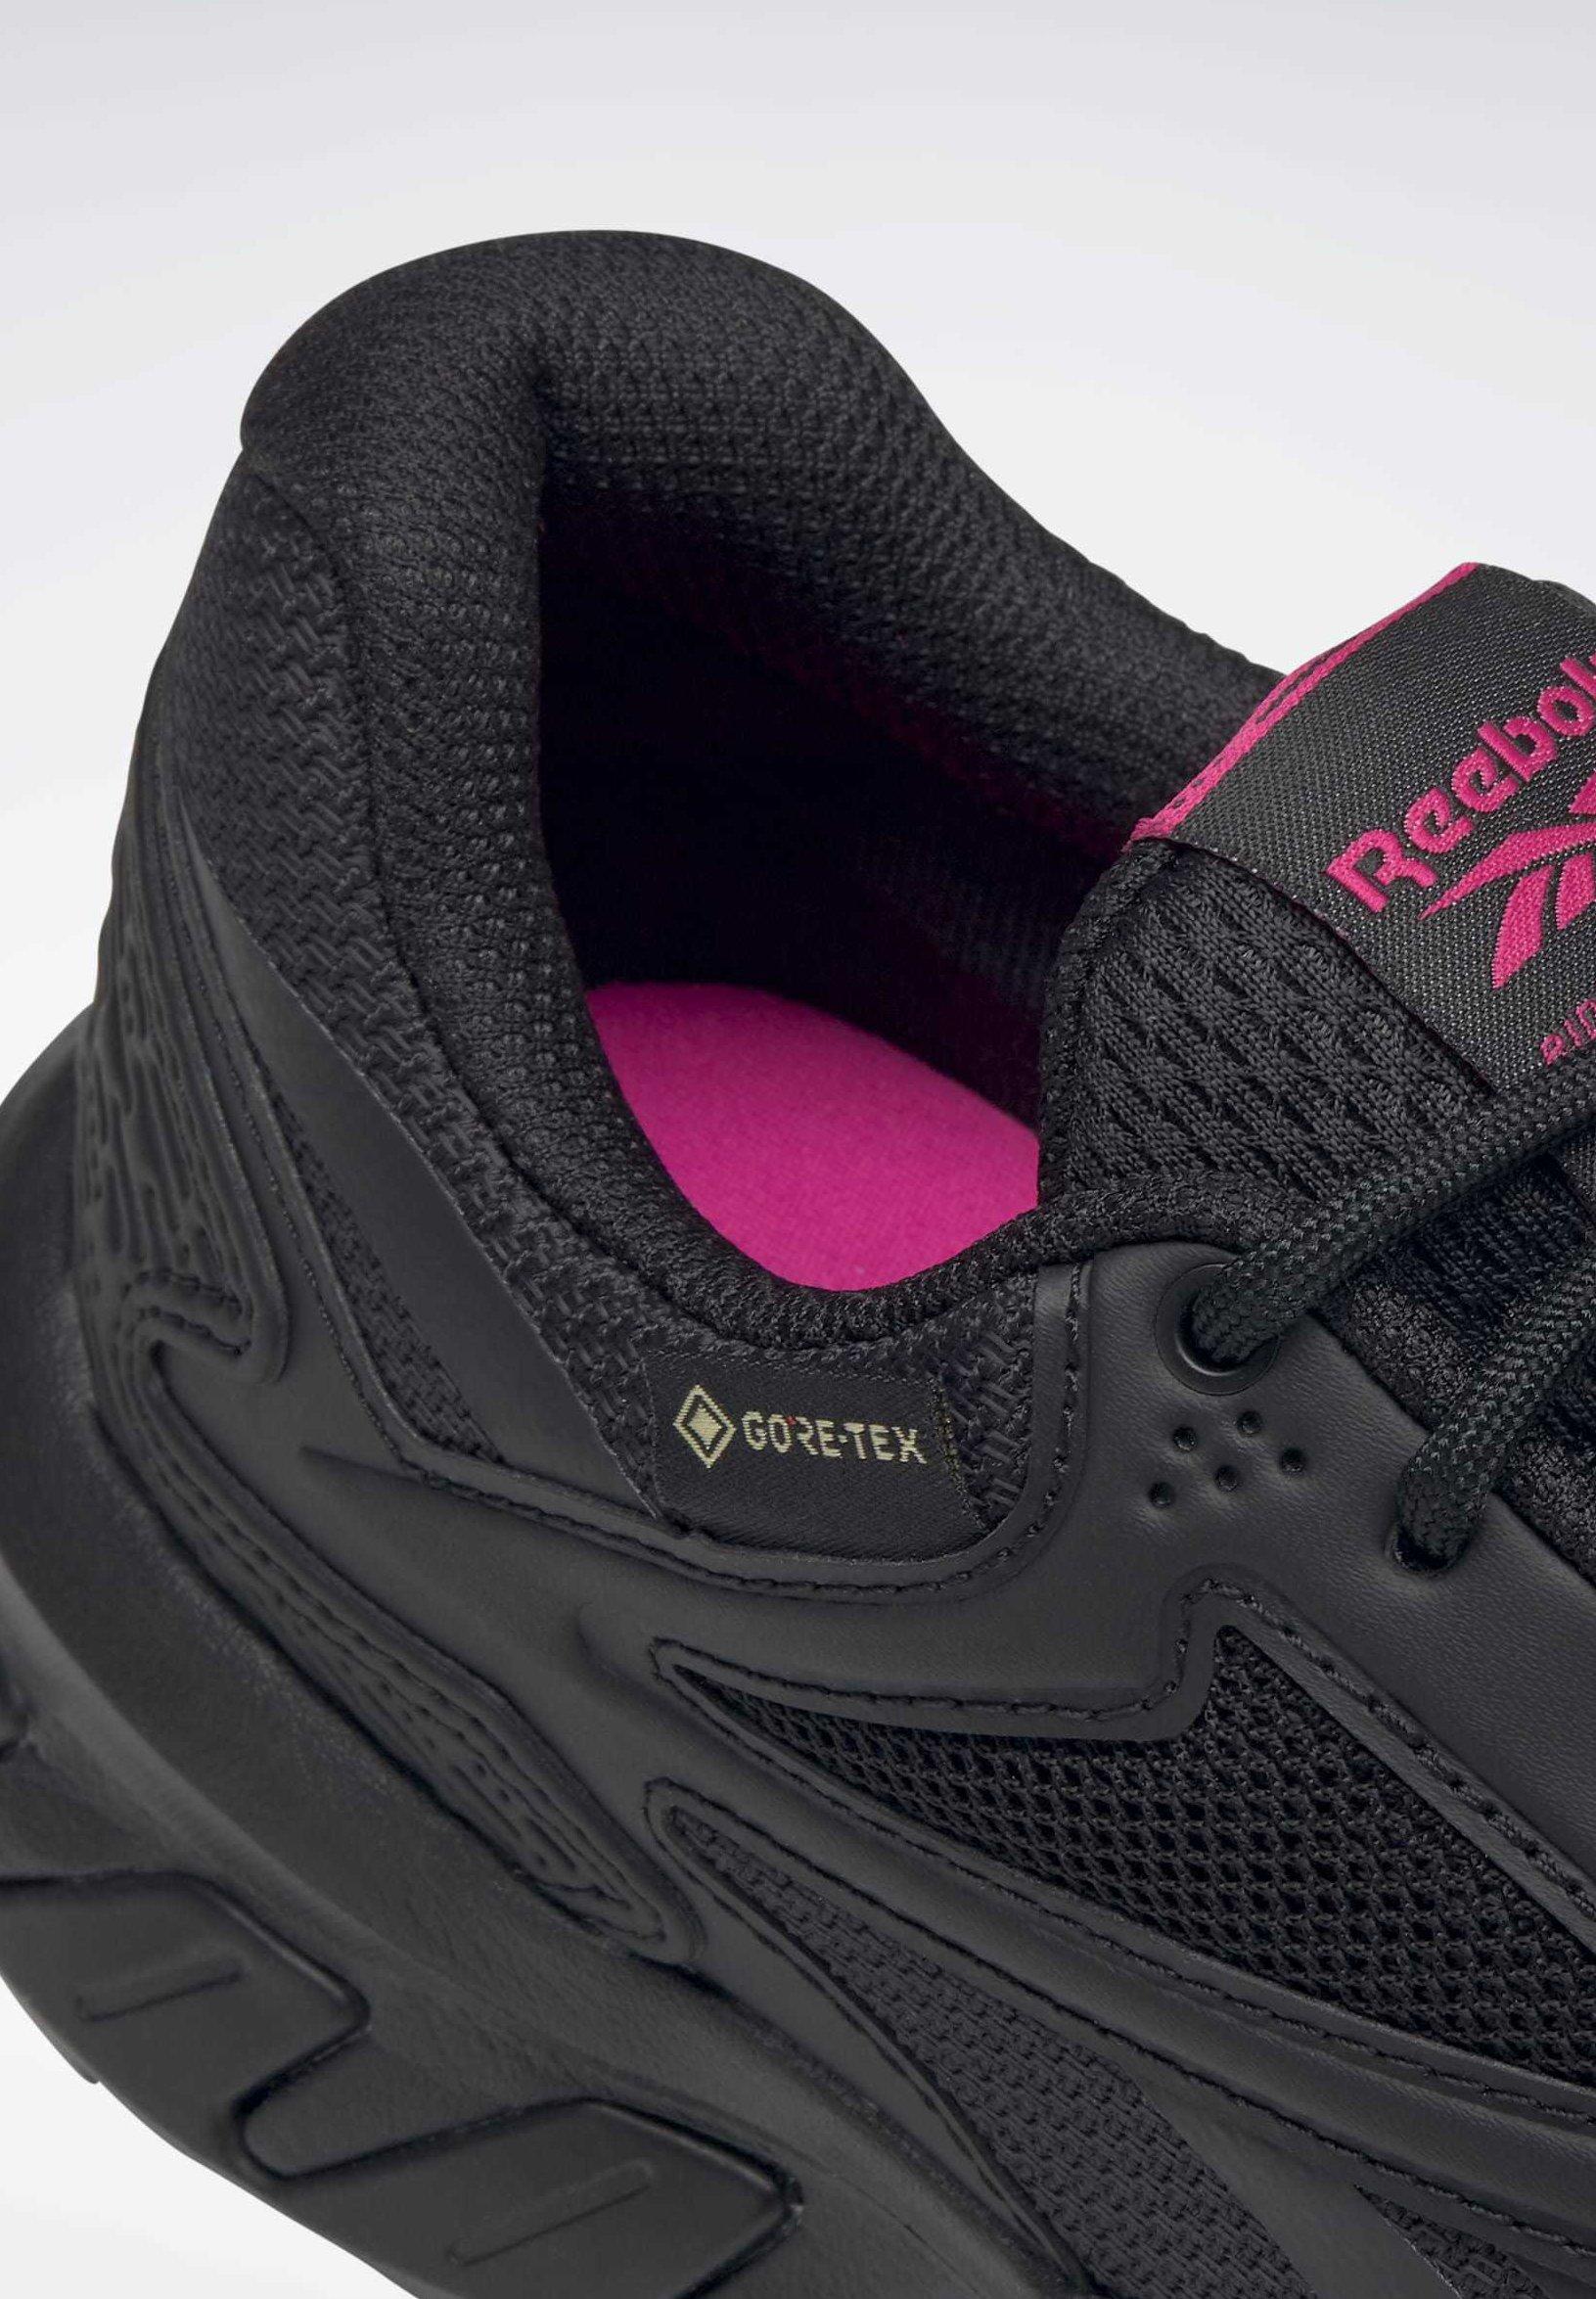 Good Selling Women's Shoes Reebok RIDGERIDER GTX 5.0 SHOES Walking shoes black e2WoomCb1